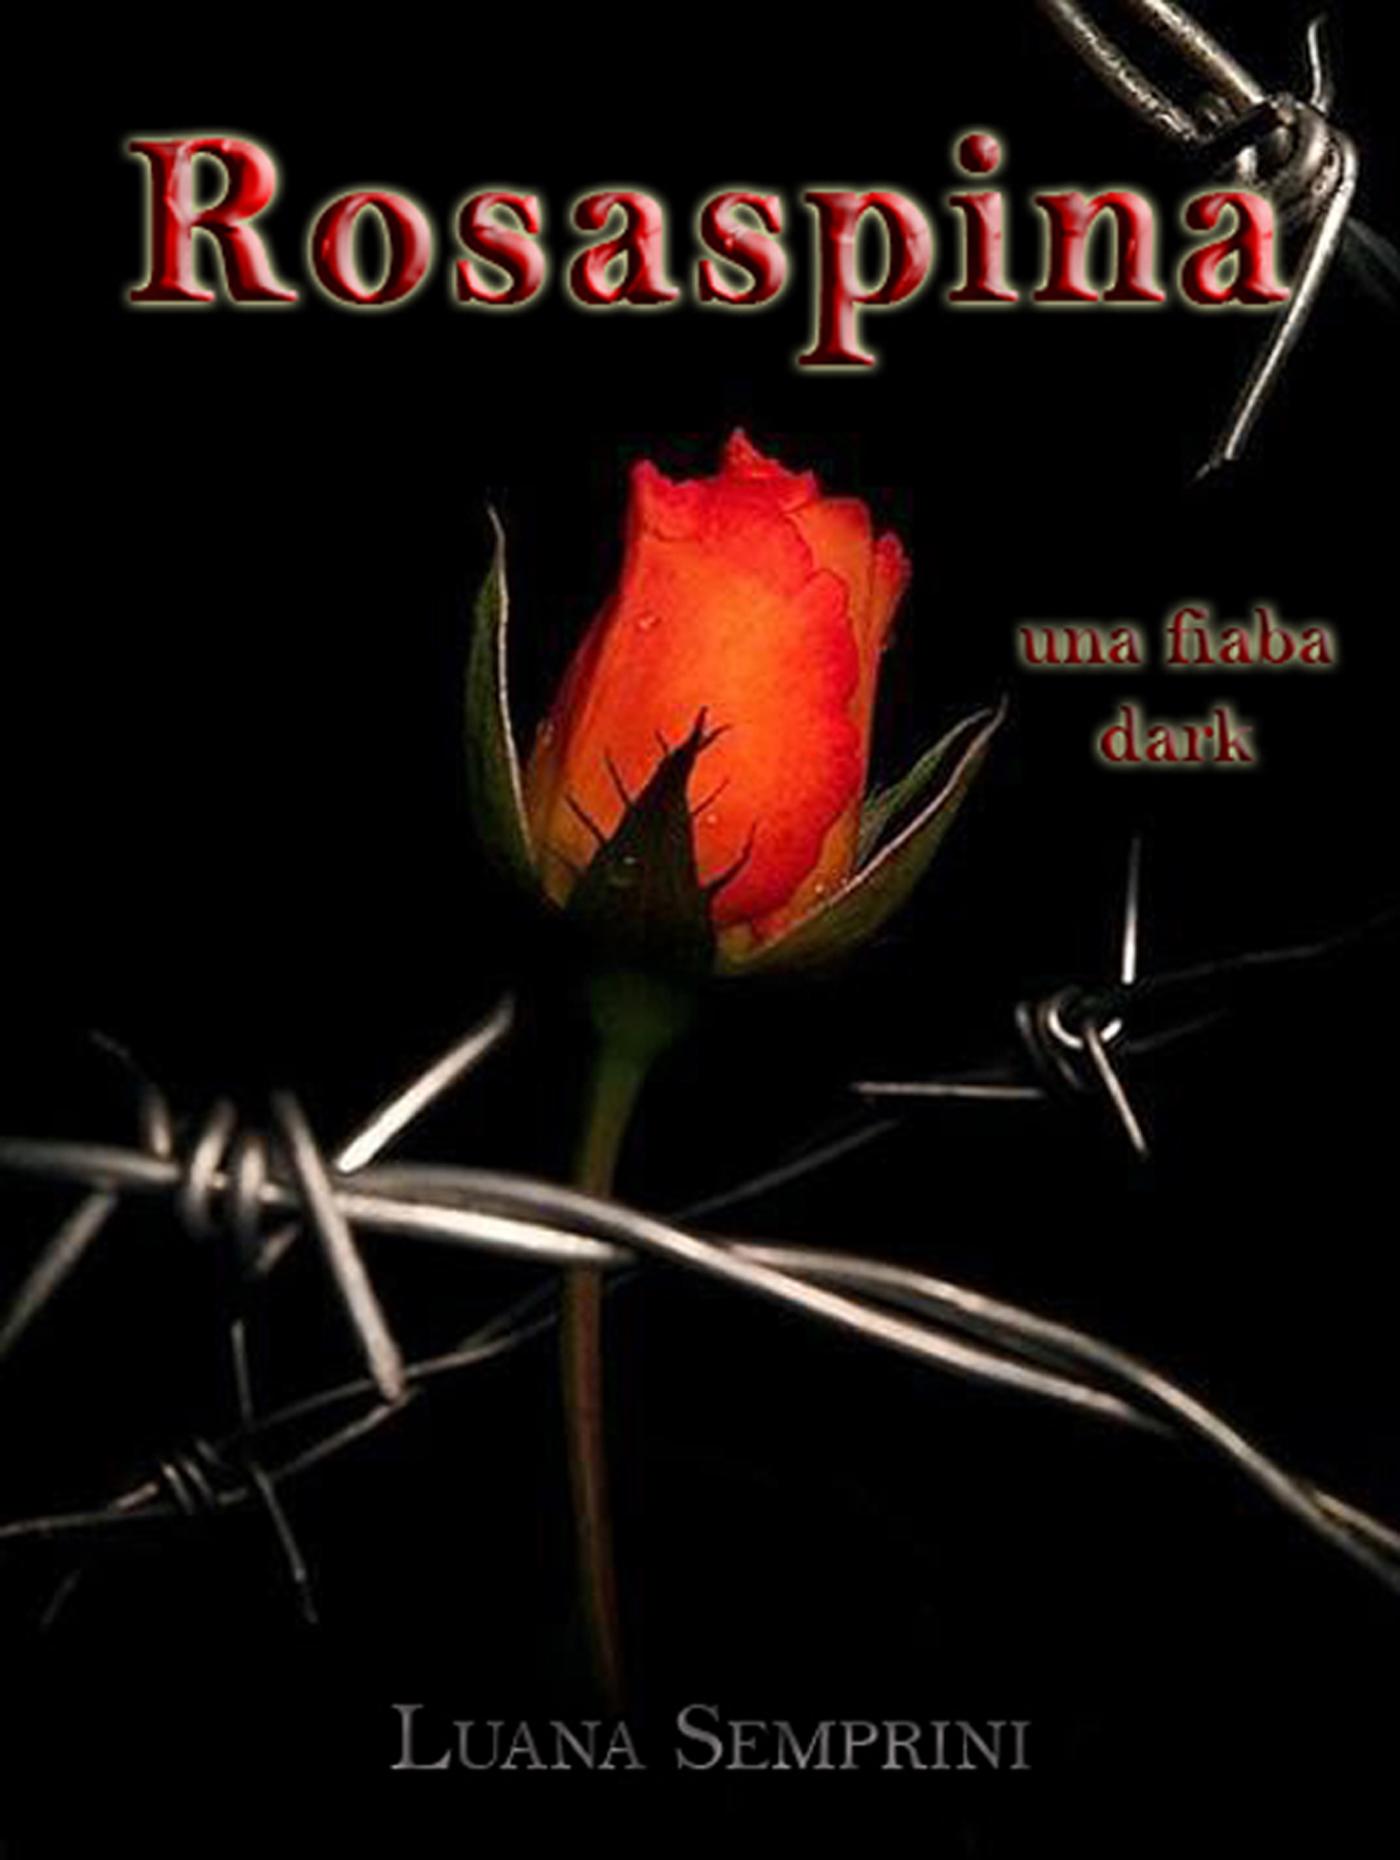 Rosaspina, una fiaba dark